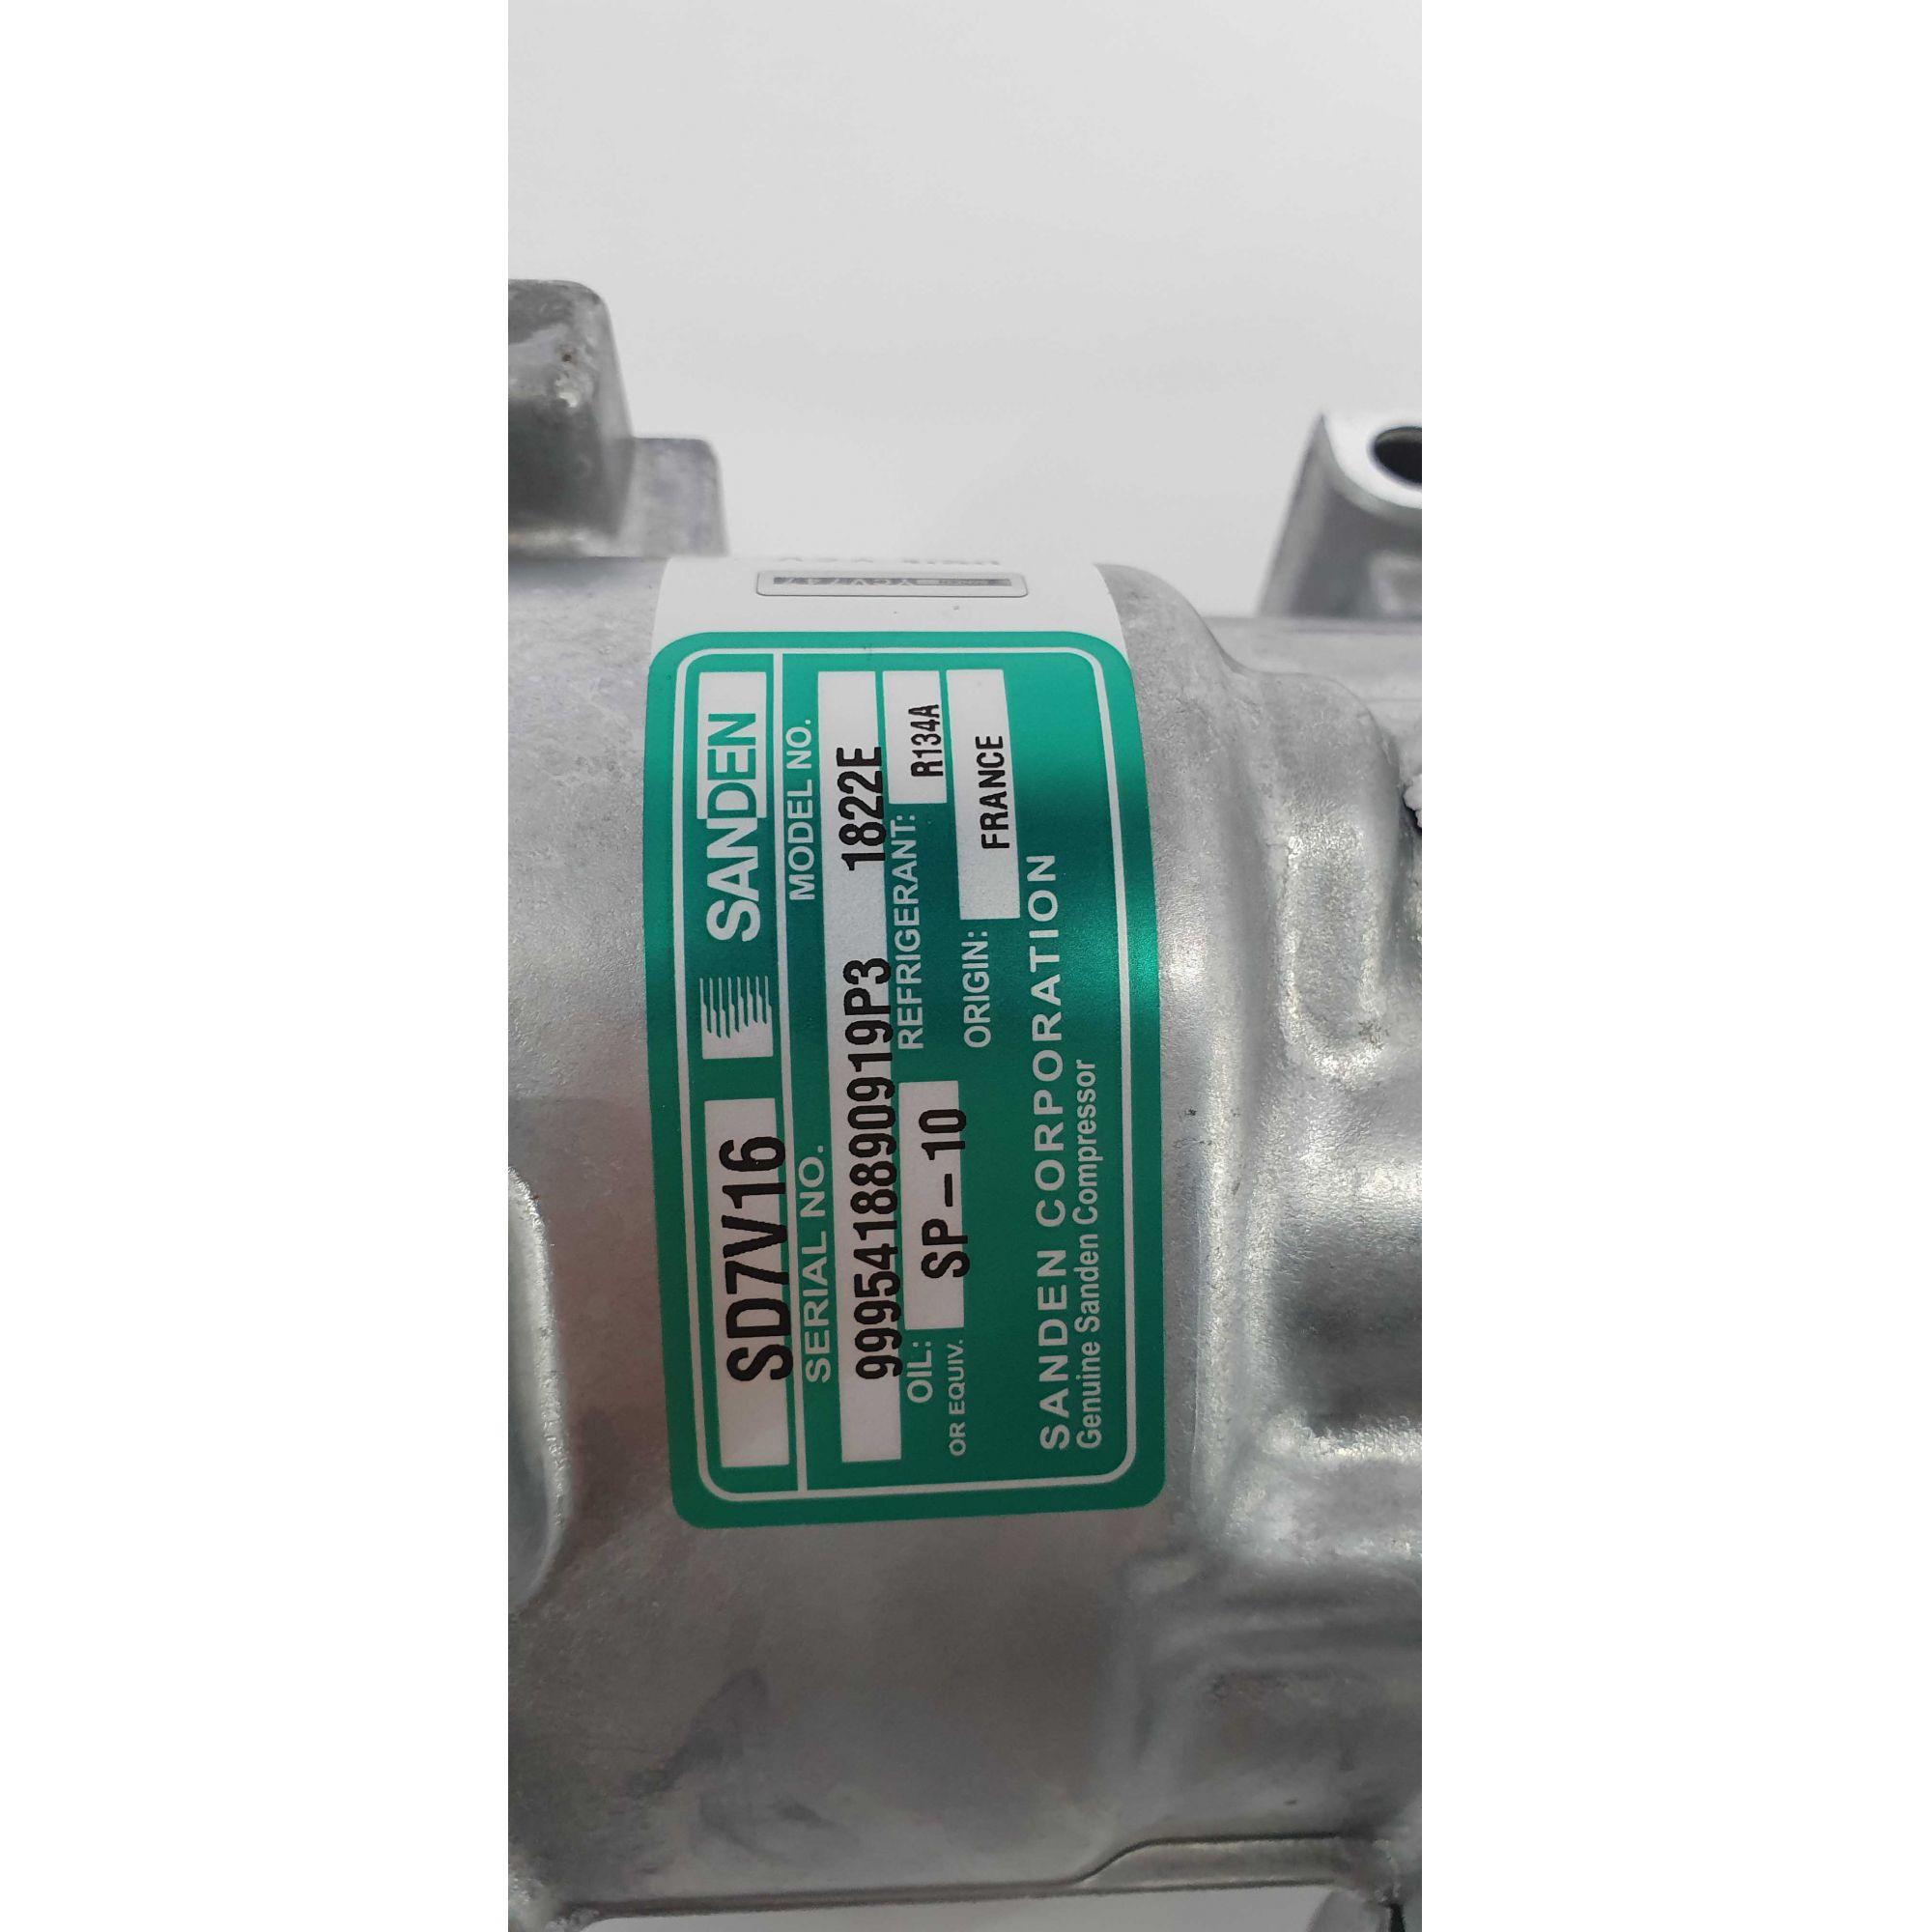 Compressor Ducato / Jumper 2.3 Multijet - SANDEN Original